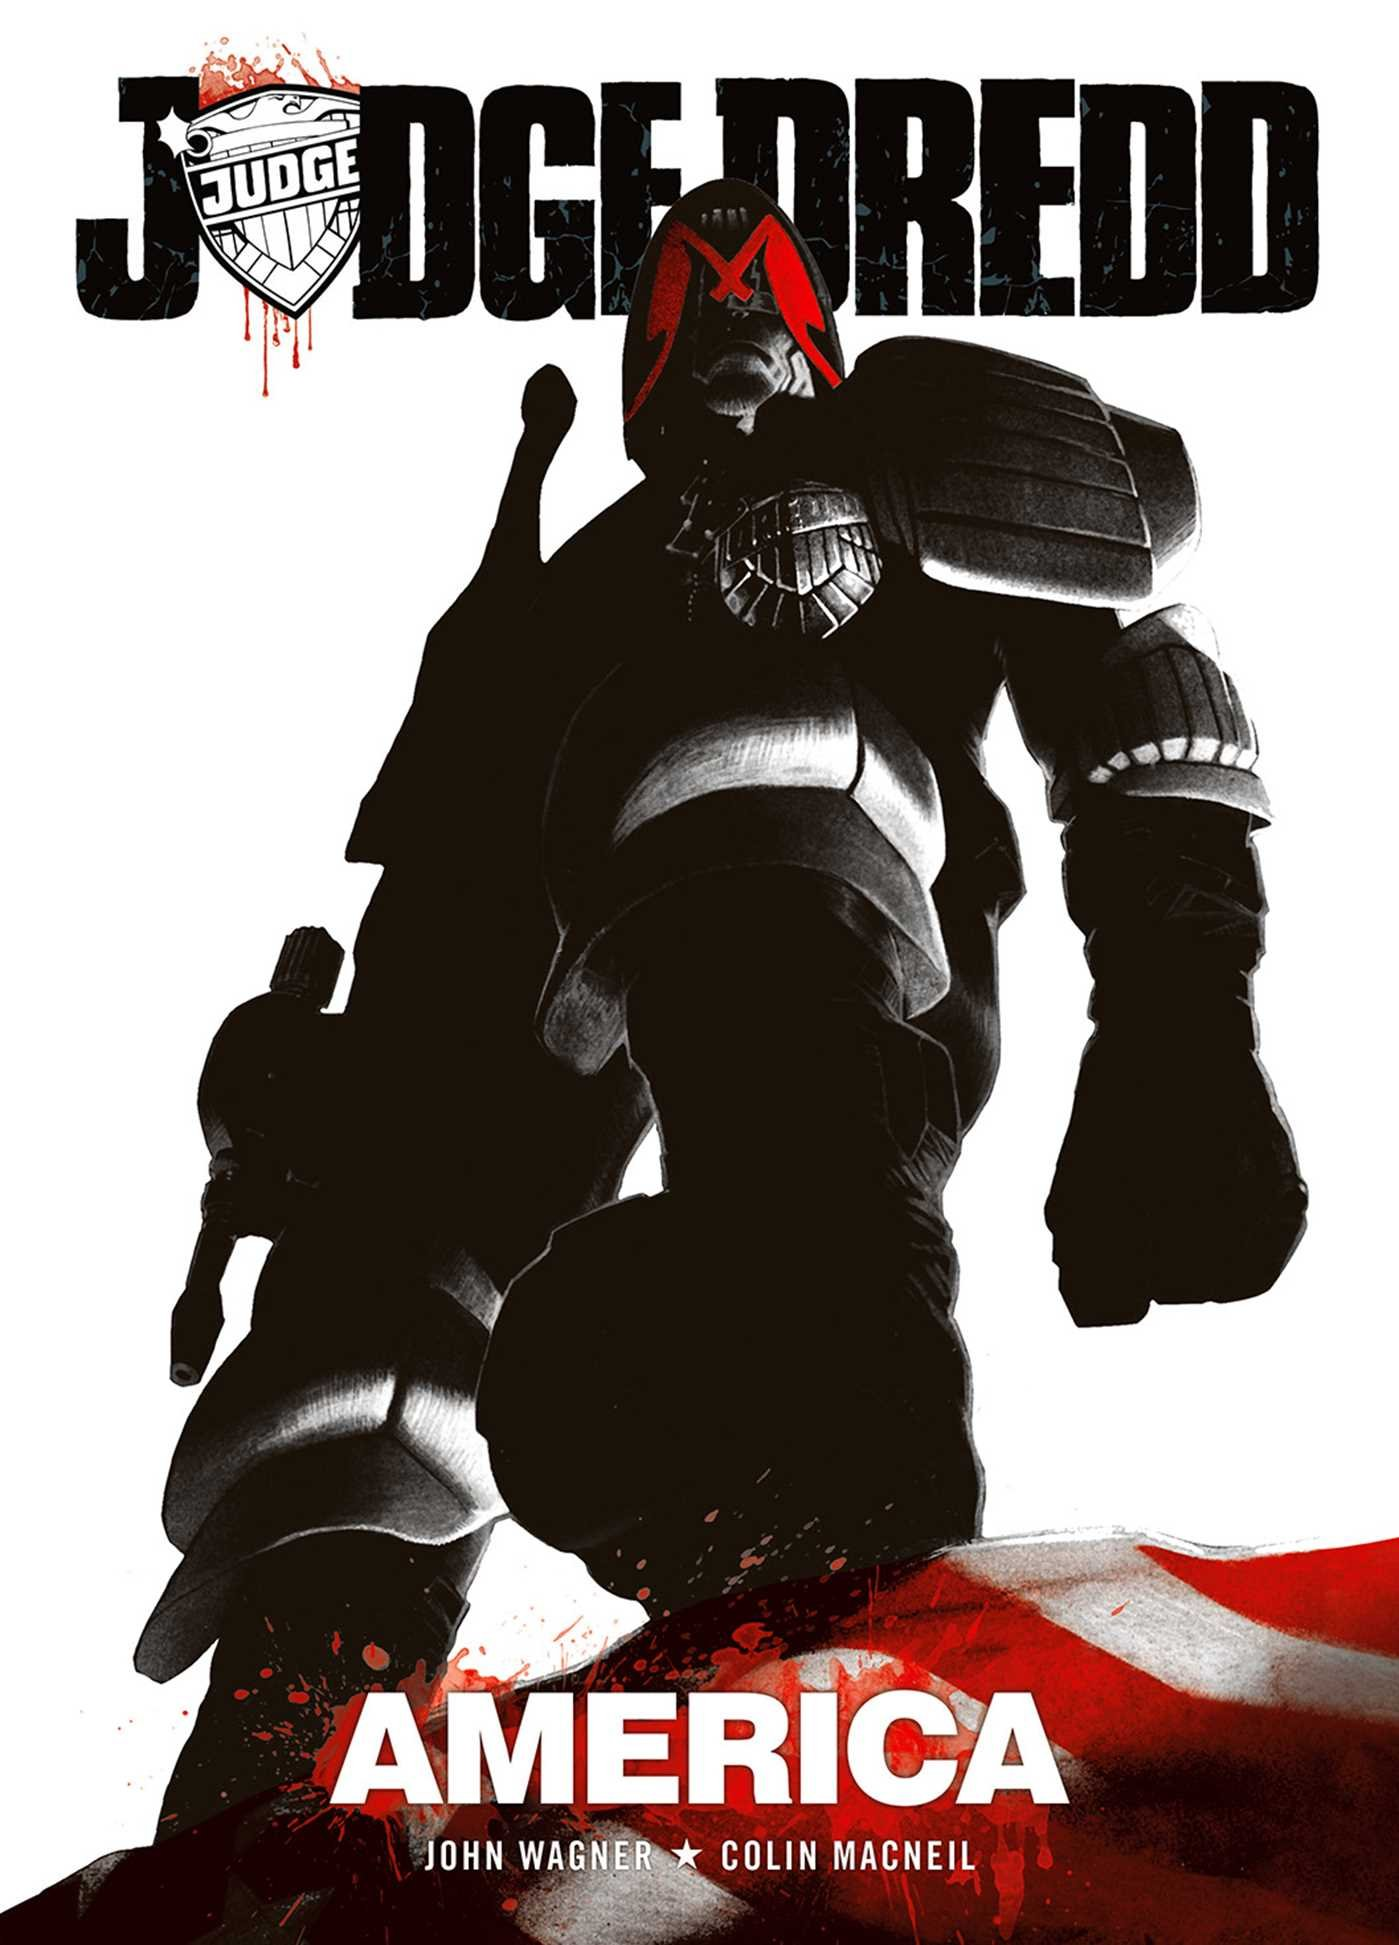 Dredd America